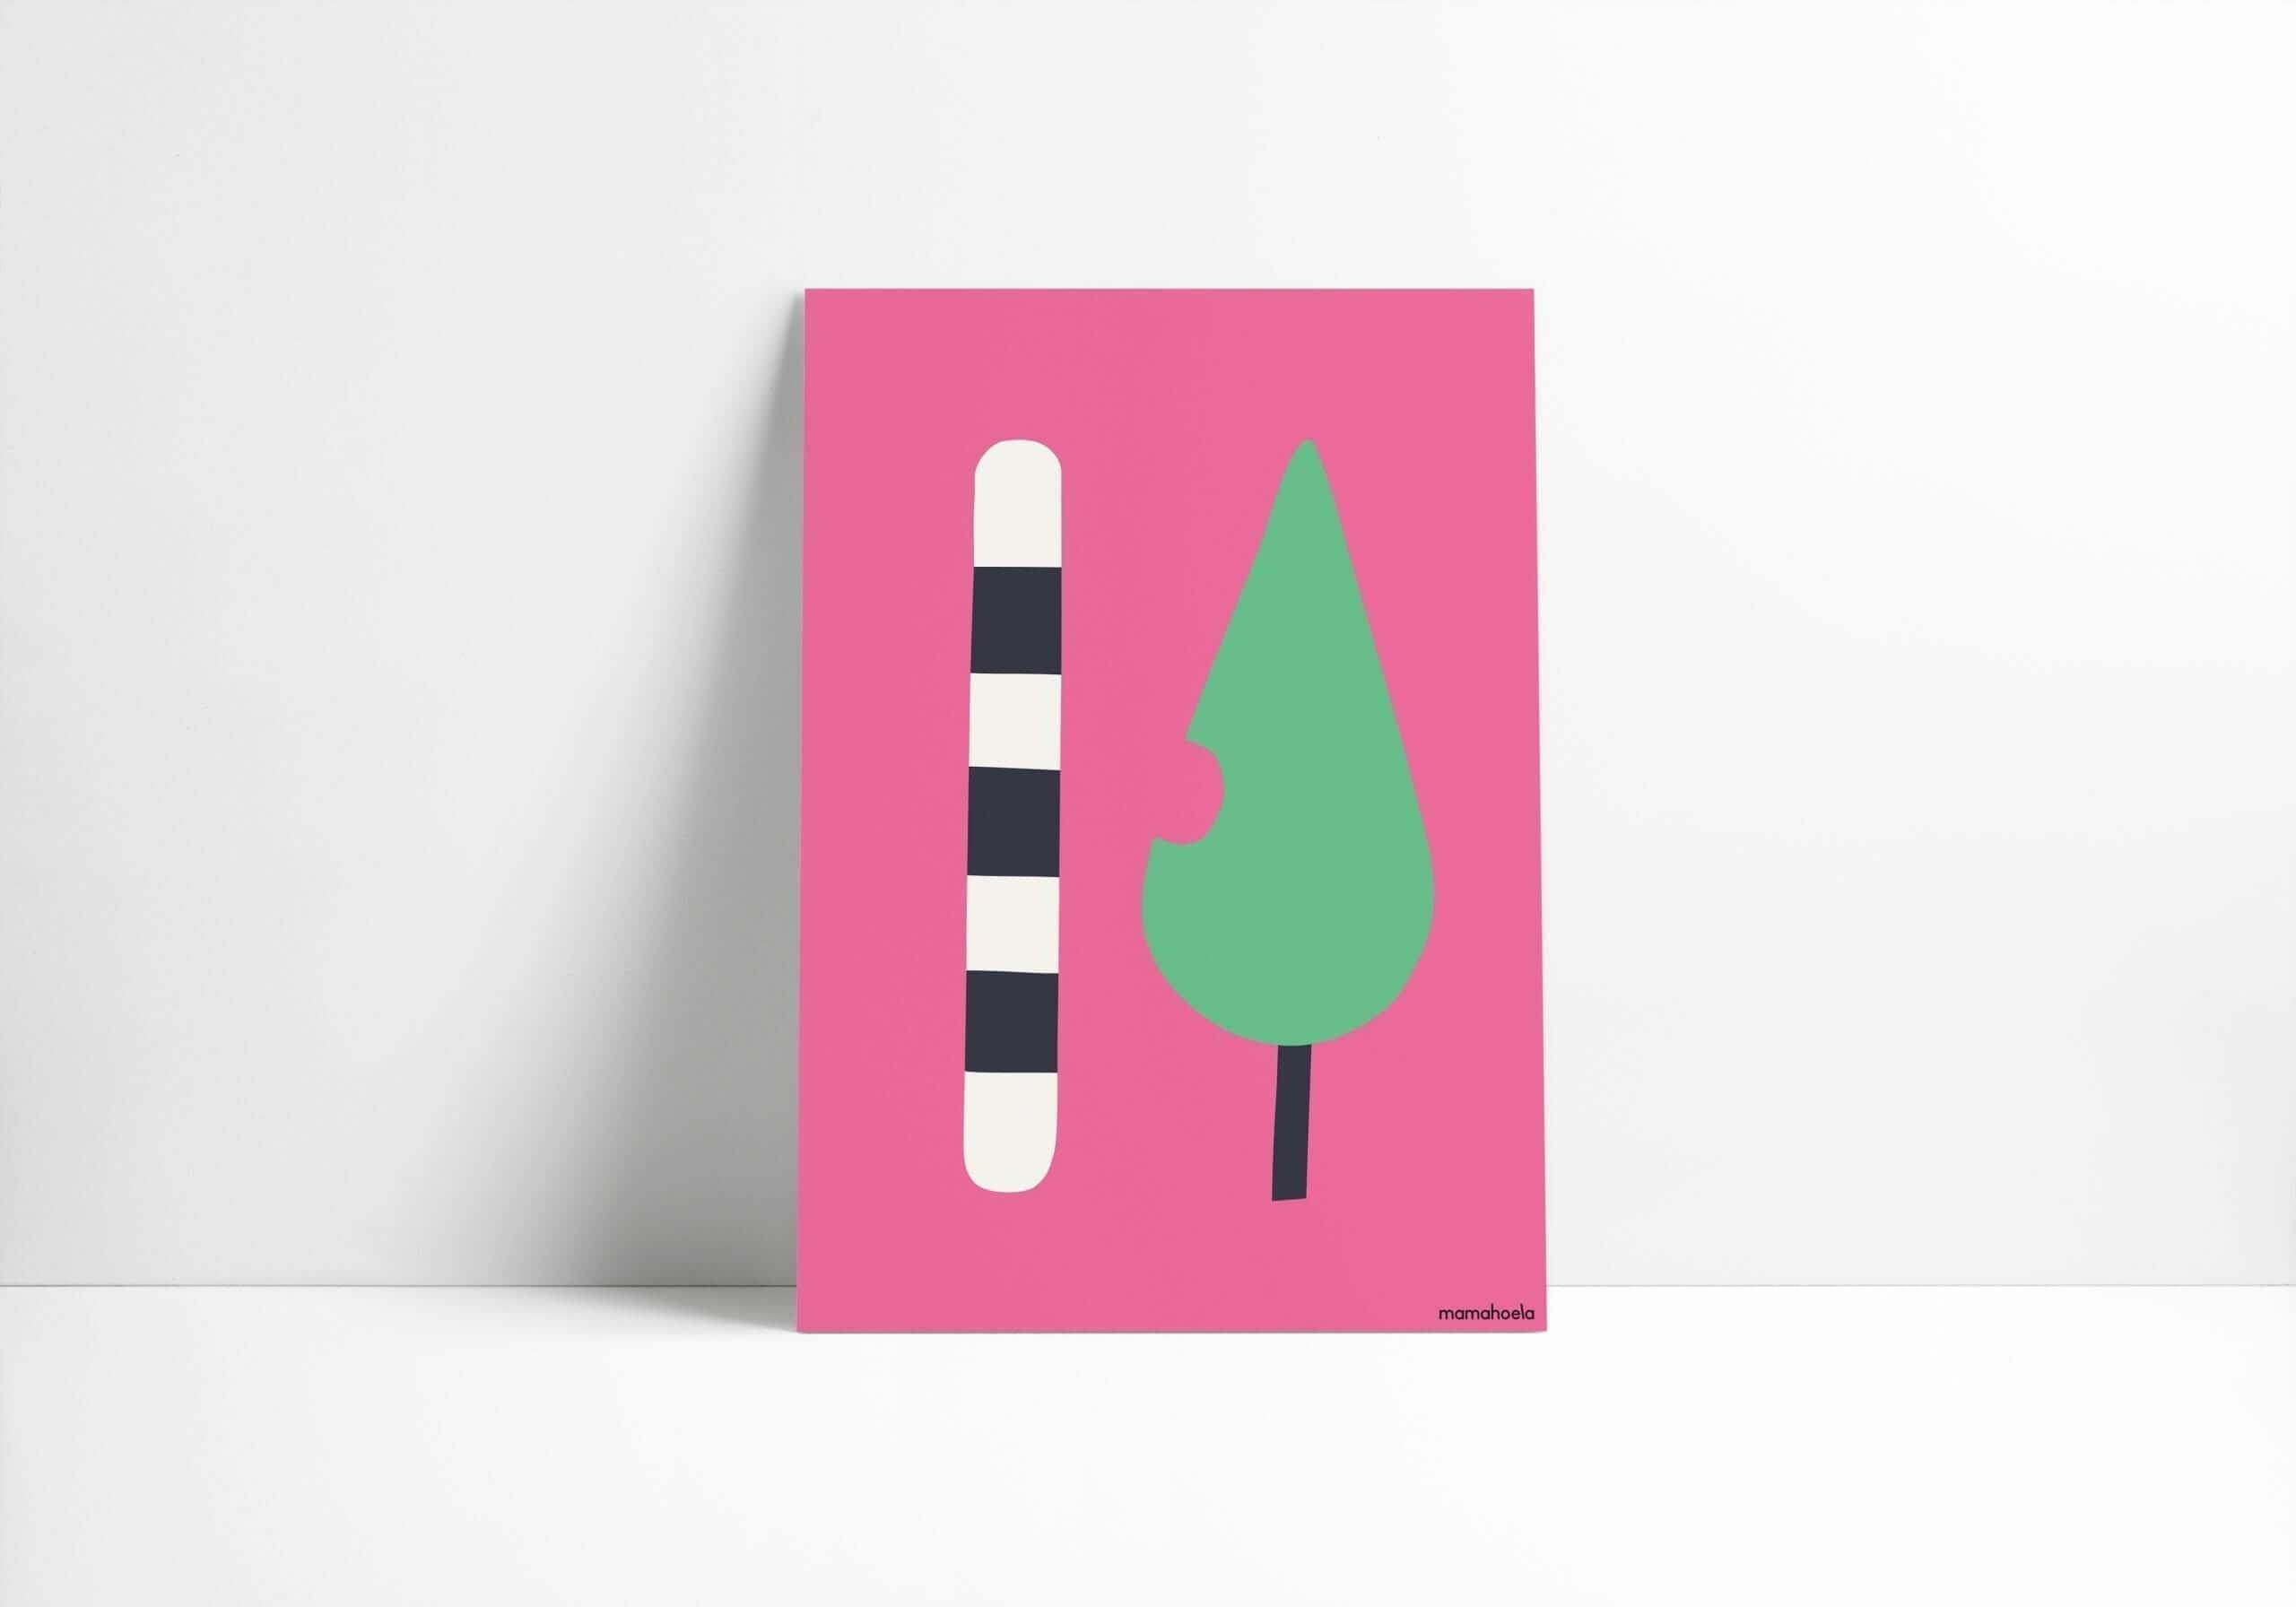 Mamahoela caterpillar poster vertical